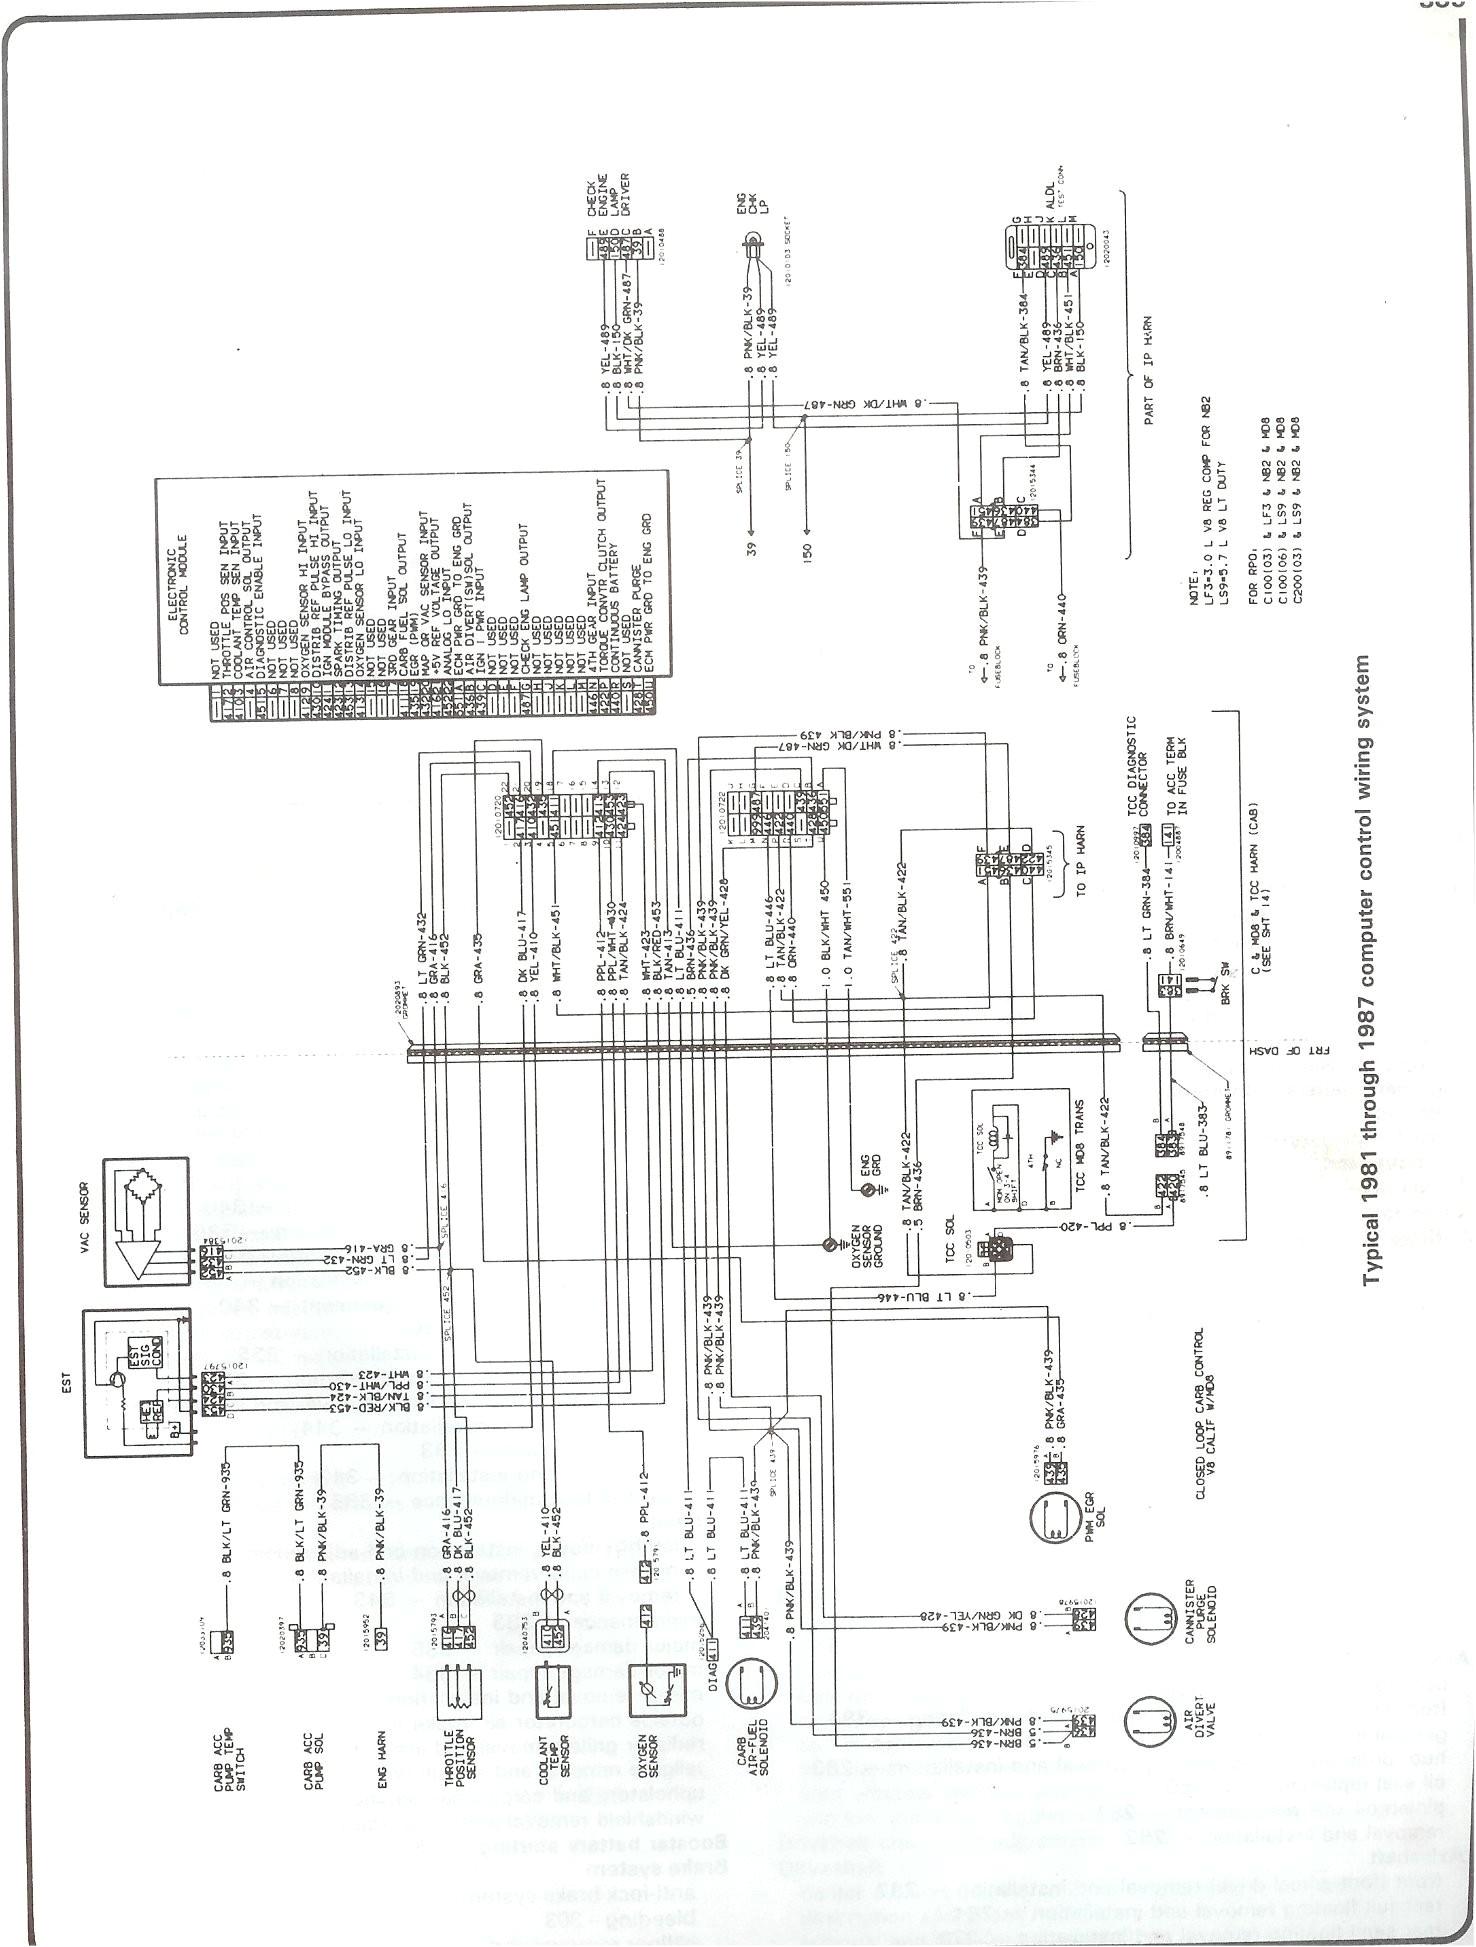 Gmc Truck Wiring Diagrams 73 Gmc Truck Wiring Diagram Wiring Diagram Post